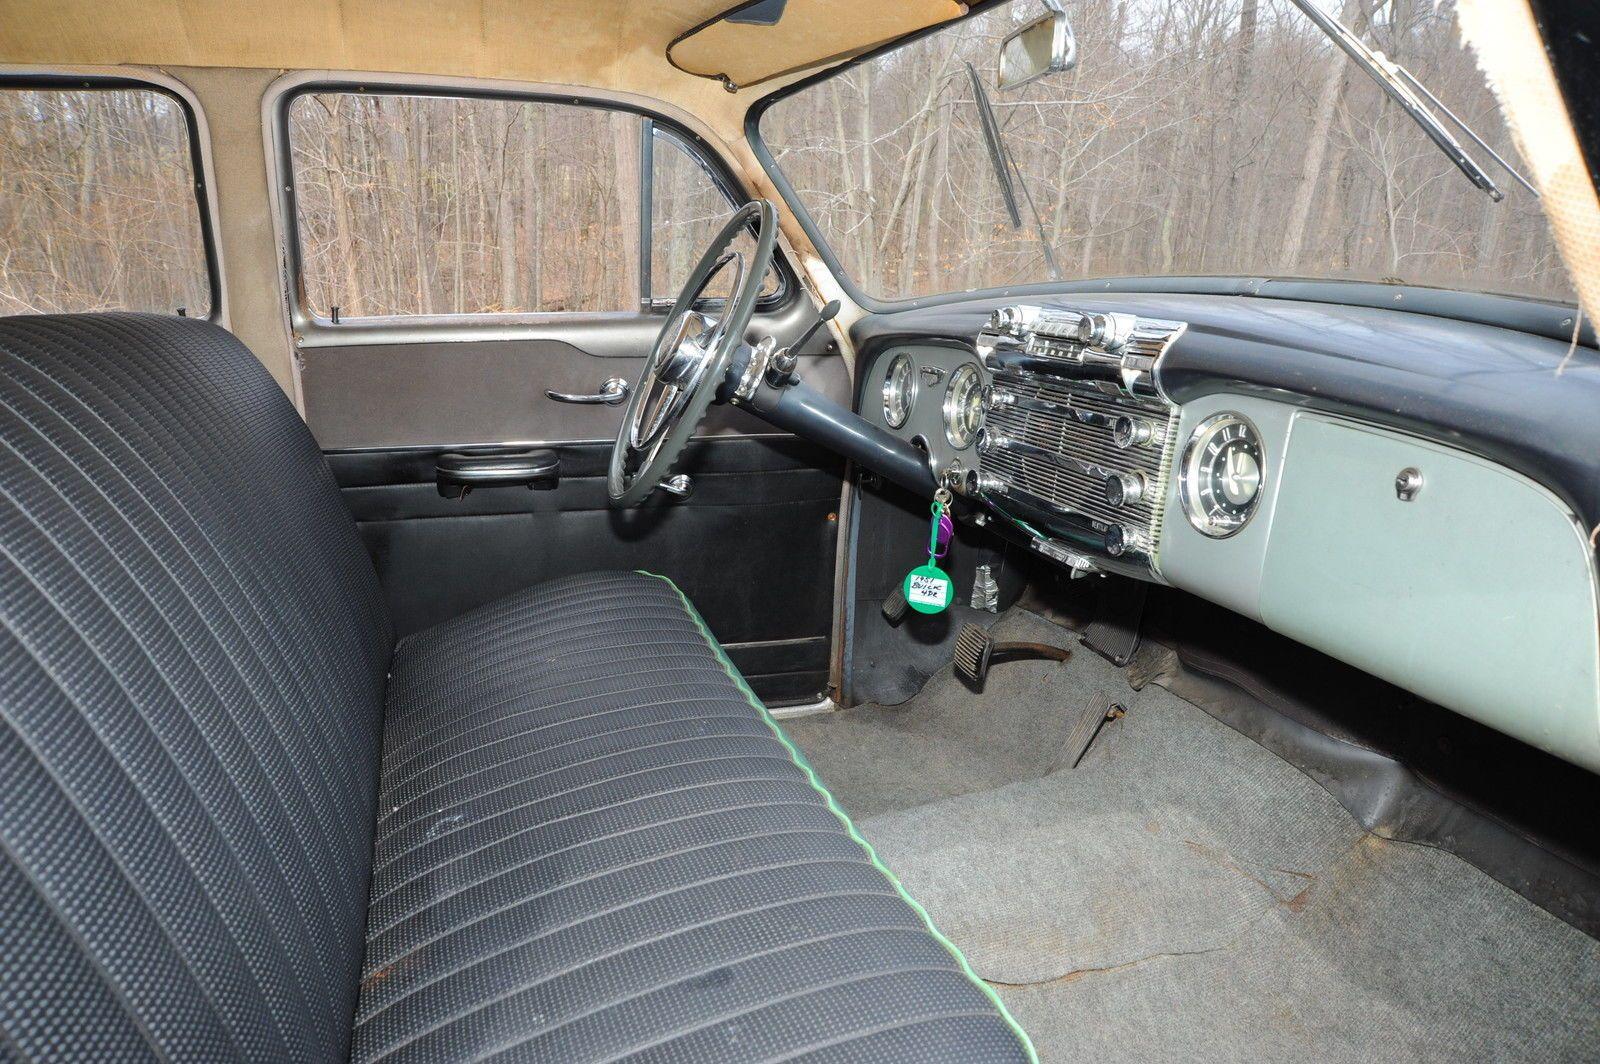 1951 Buick Other 4dr Sedan | eBay